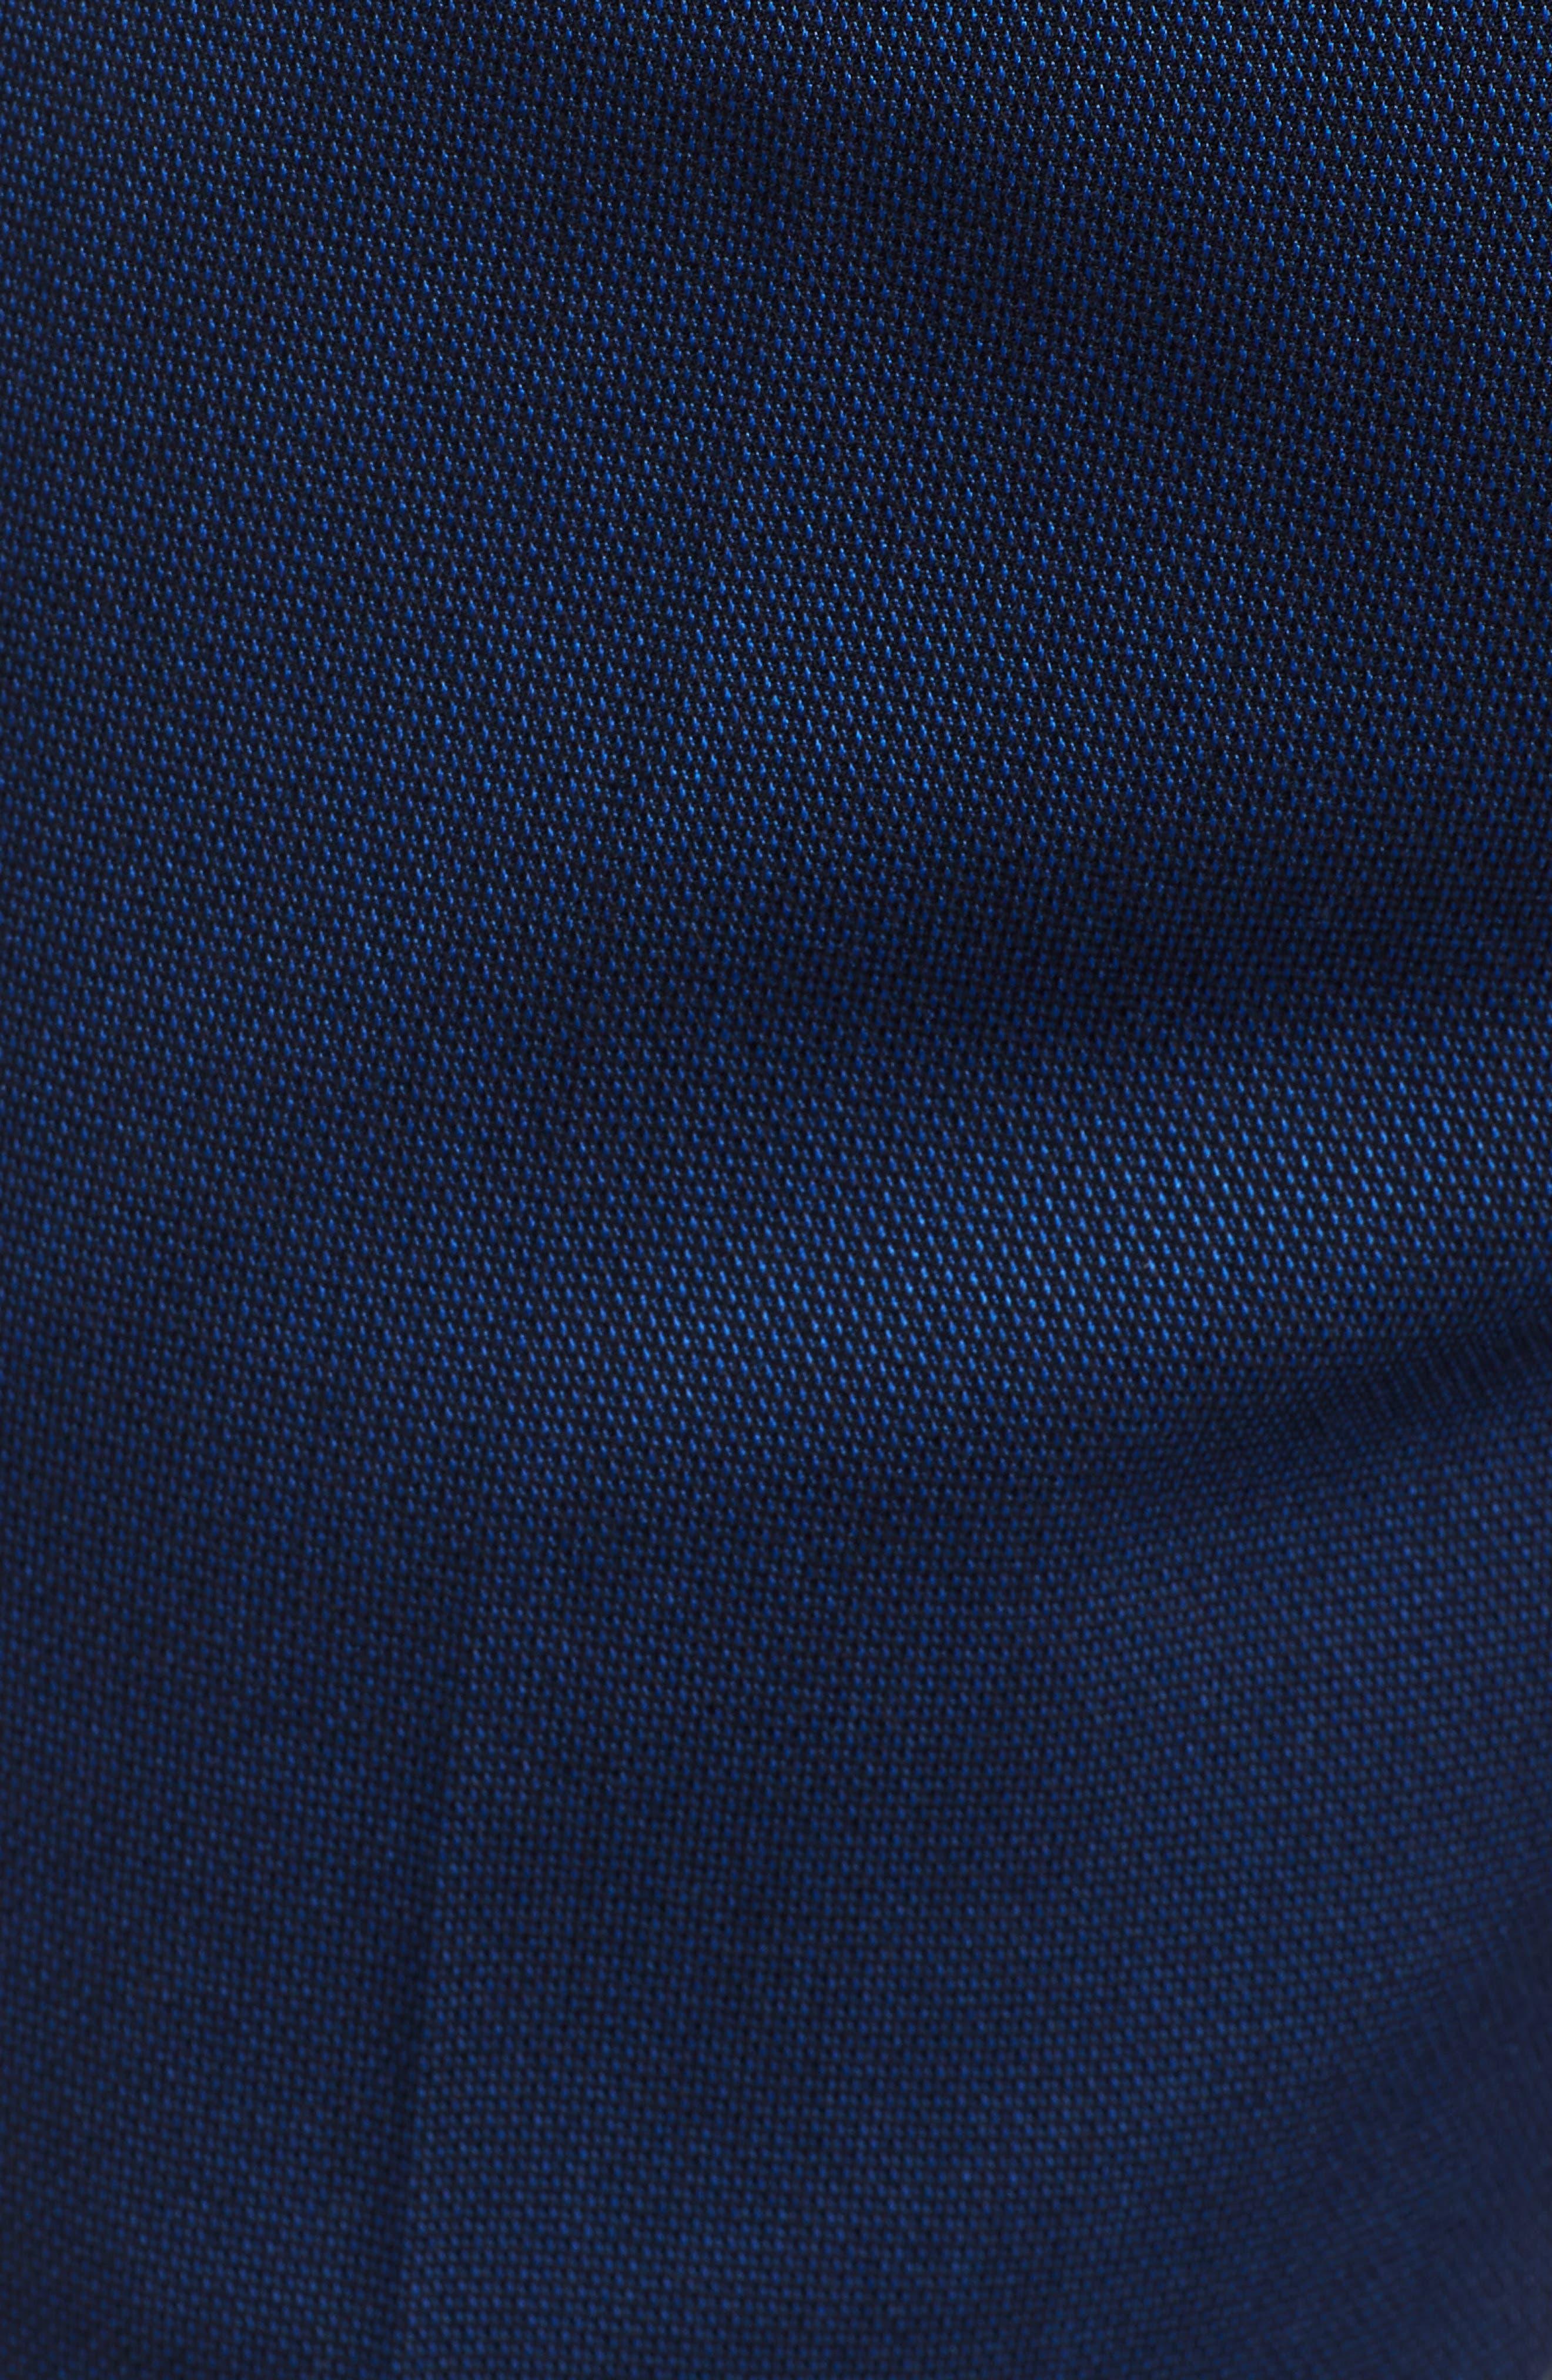 TOPMAN, Skinny Fit Suit Pants, Alternate thumbnail 6, color, MID BLUE